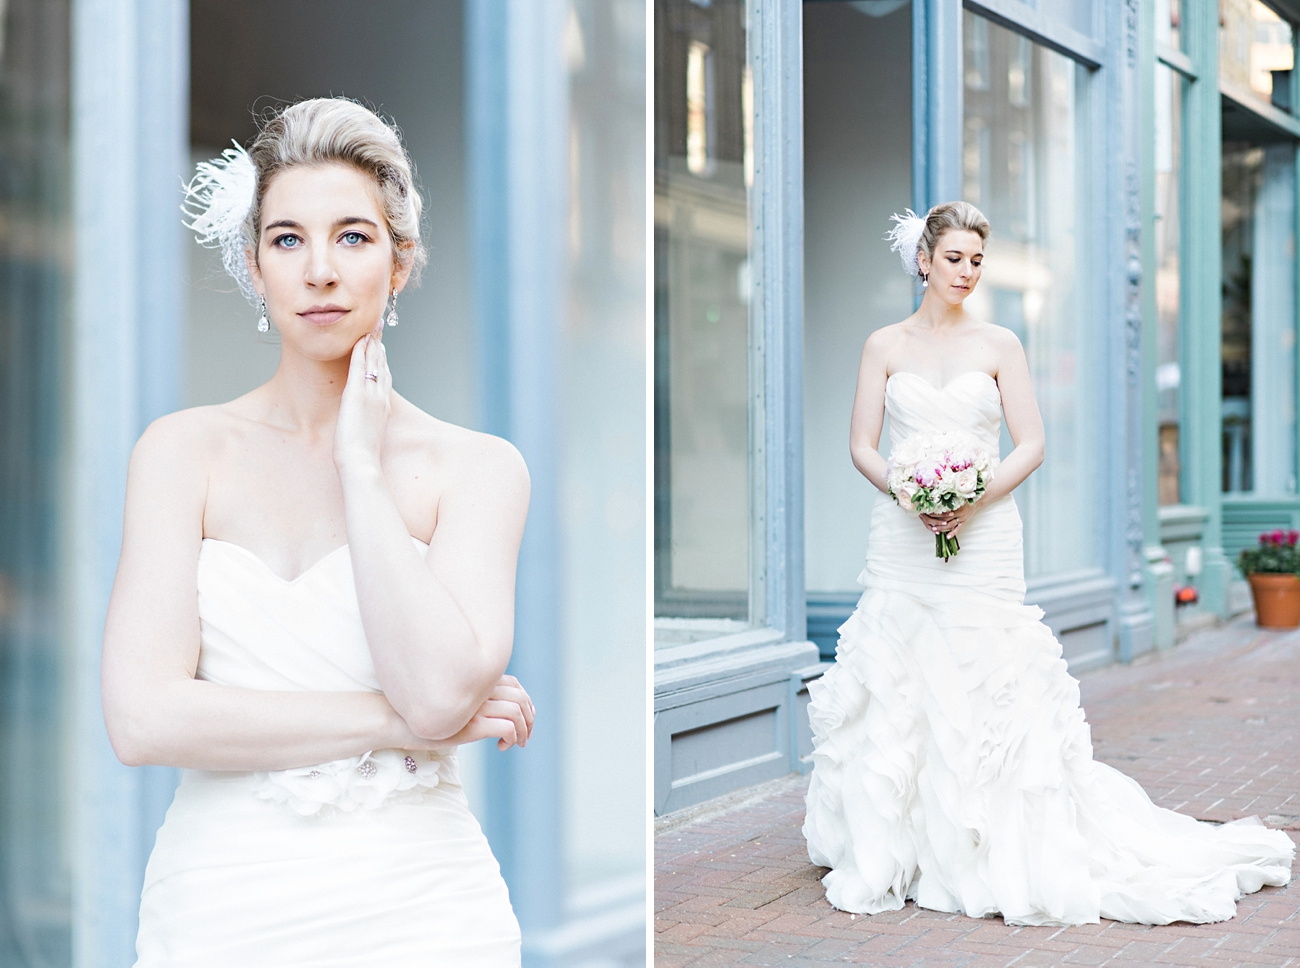 Sara-Seans-Halifax-Prince-George-Hotel-Wedding055.jpg